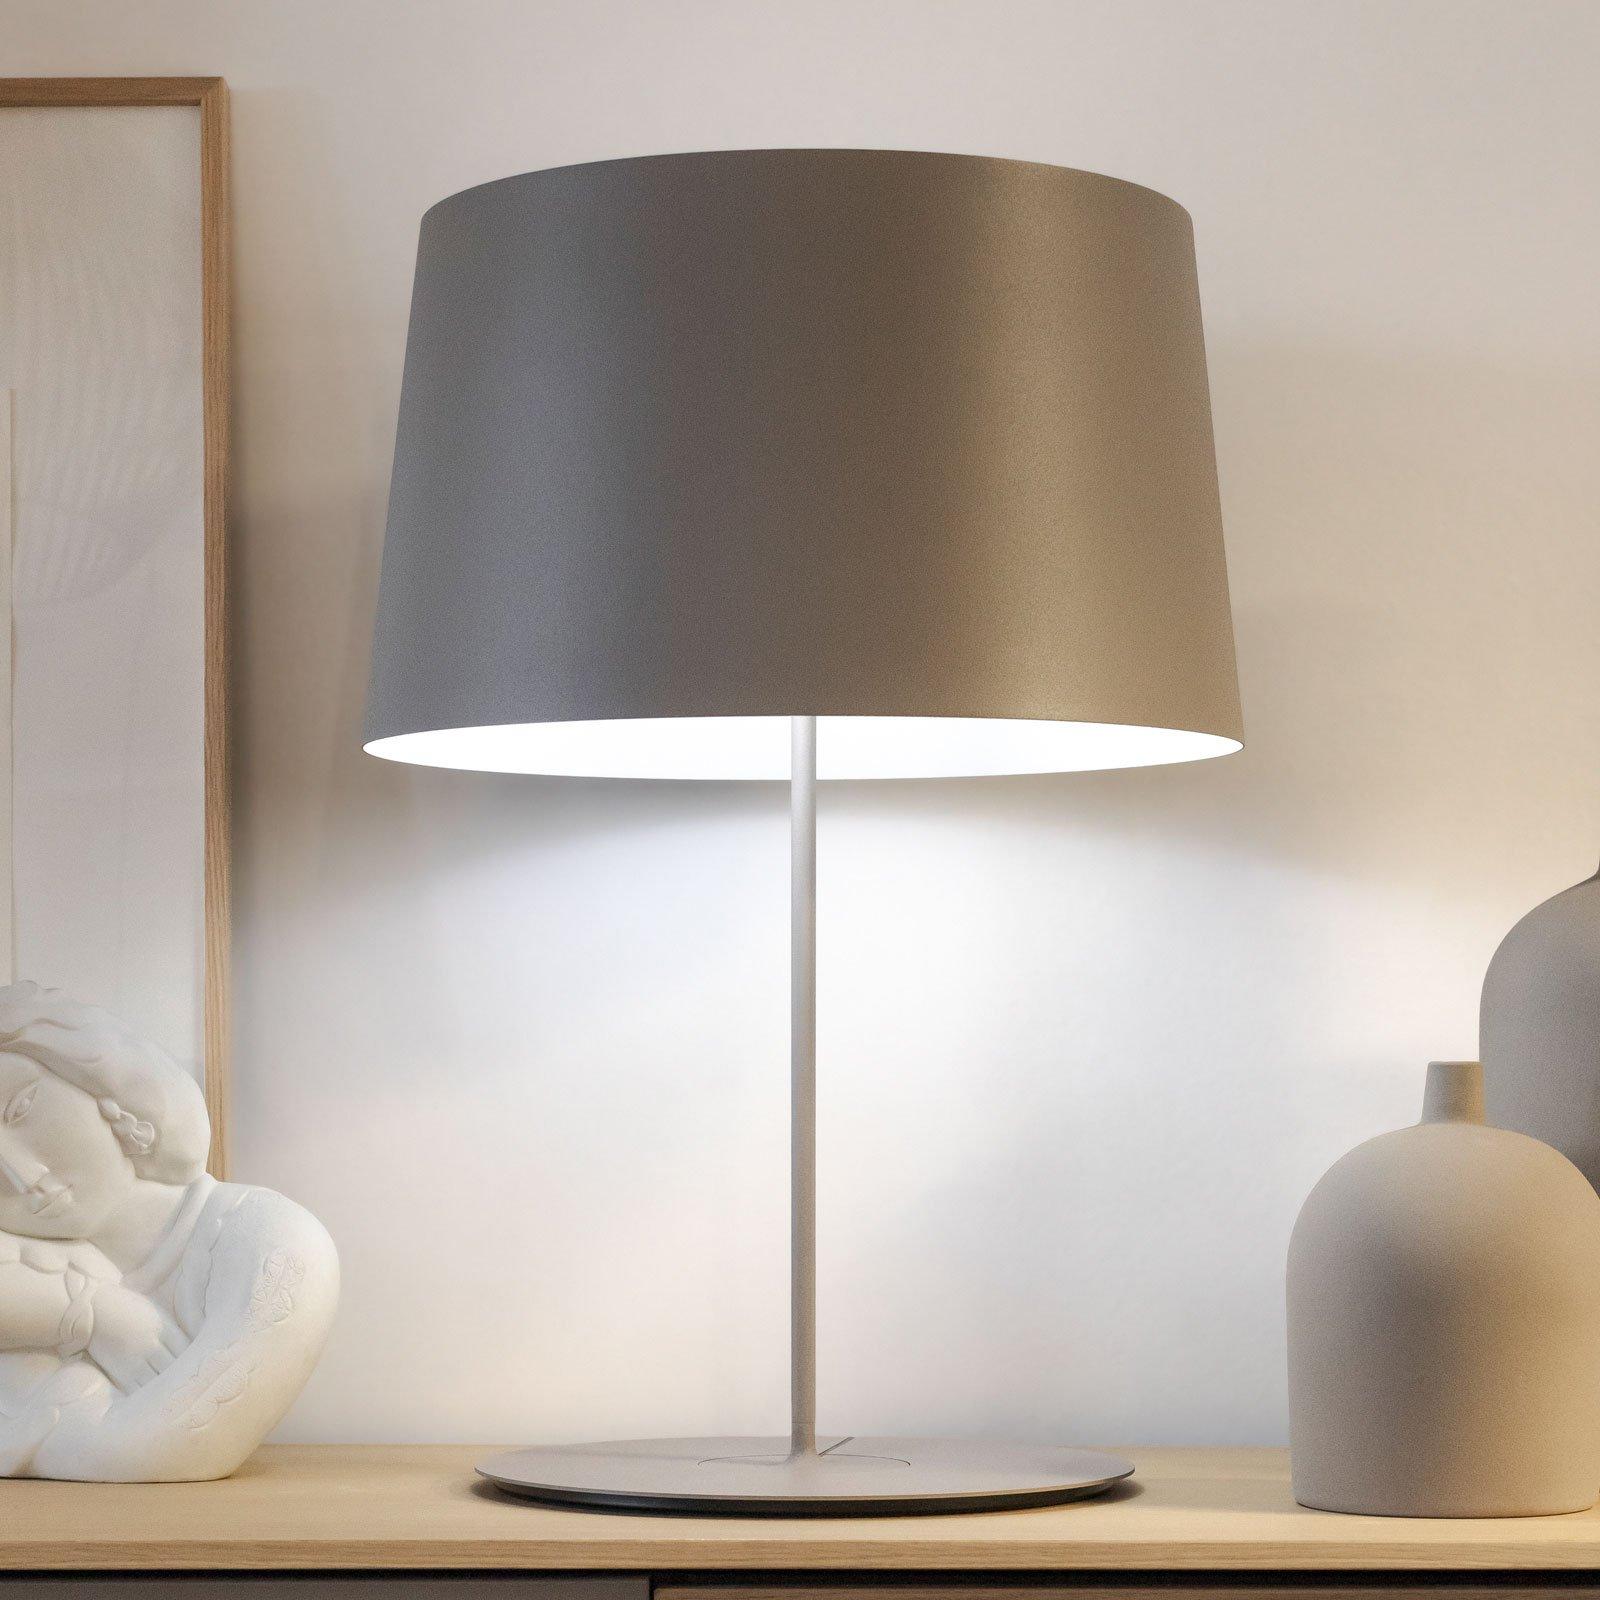 Vibia Warm 4901 bordlampe, Ø 42 cm, beige